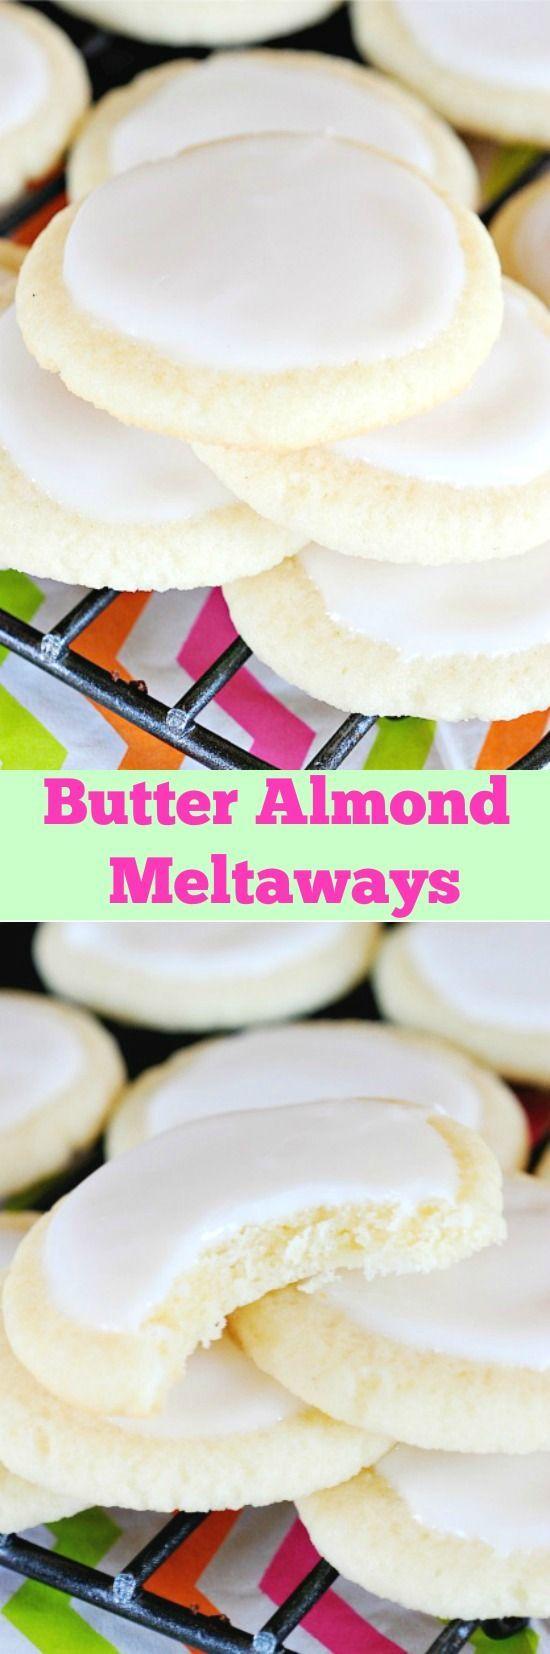 Glazed Butter Almond Meltaway Cookies